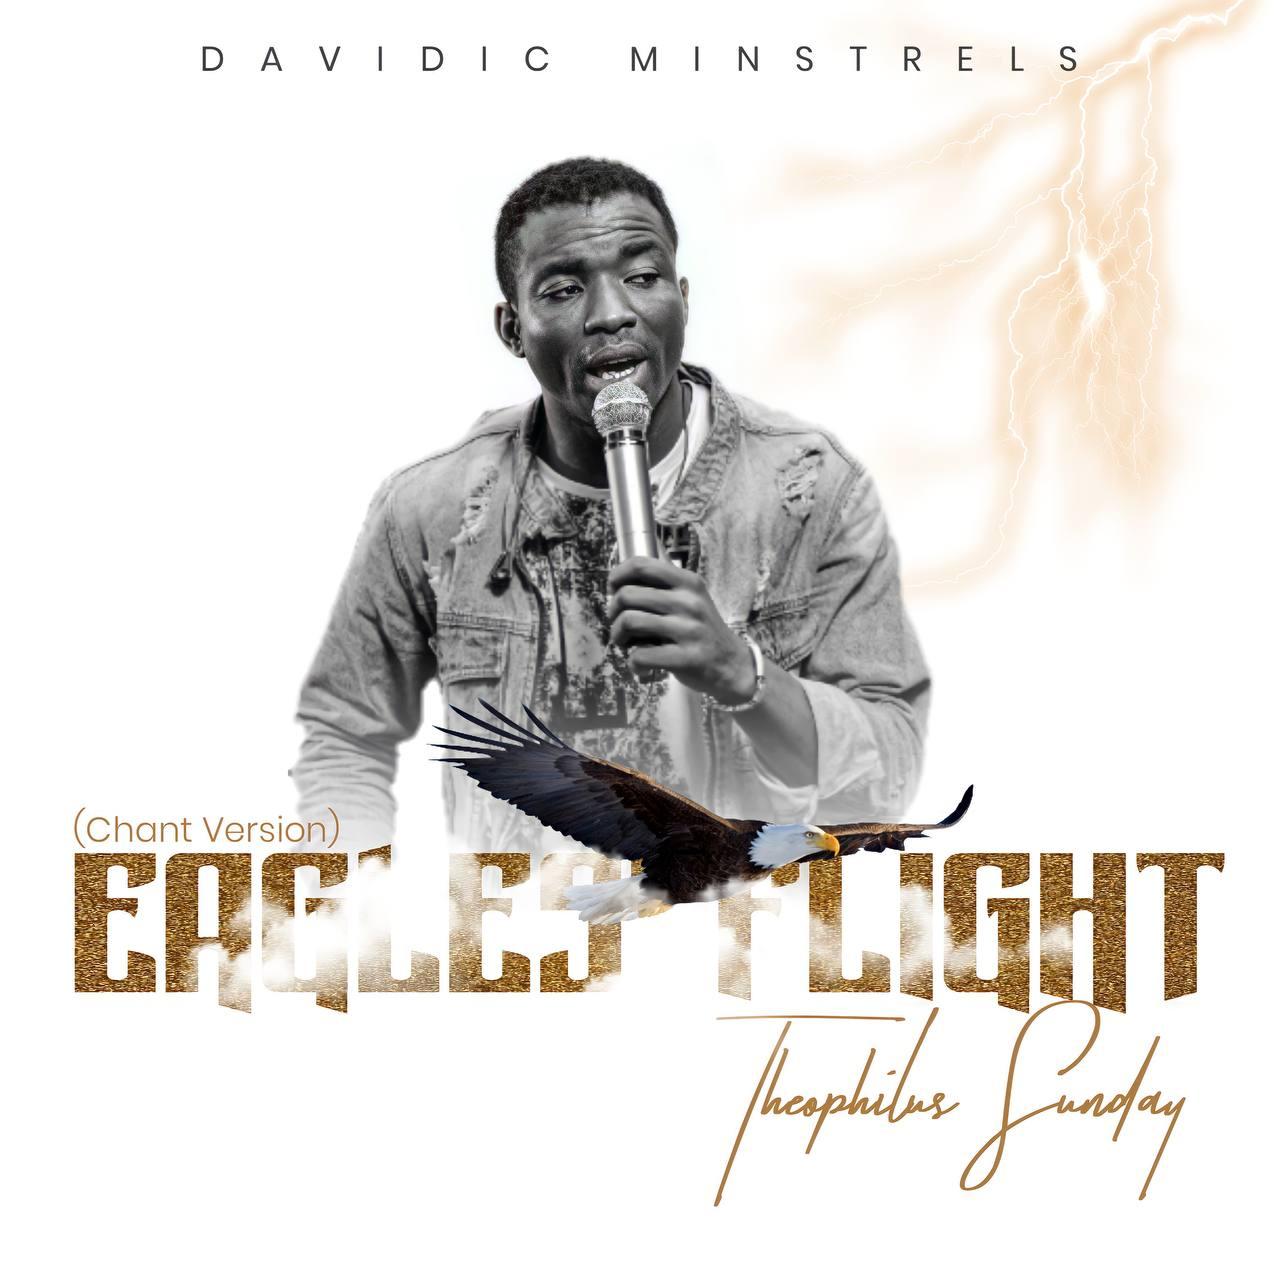 Theophilus Sunday - Eagles Flight (Chant Version)